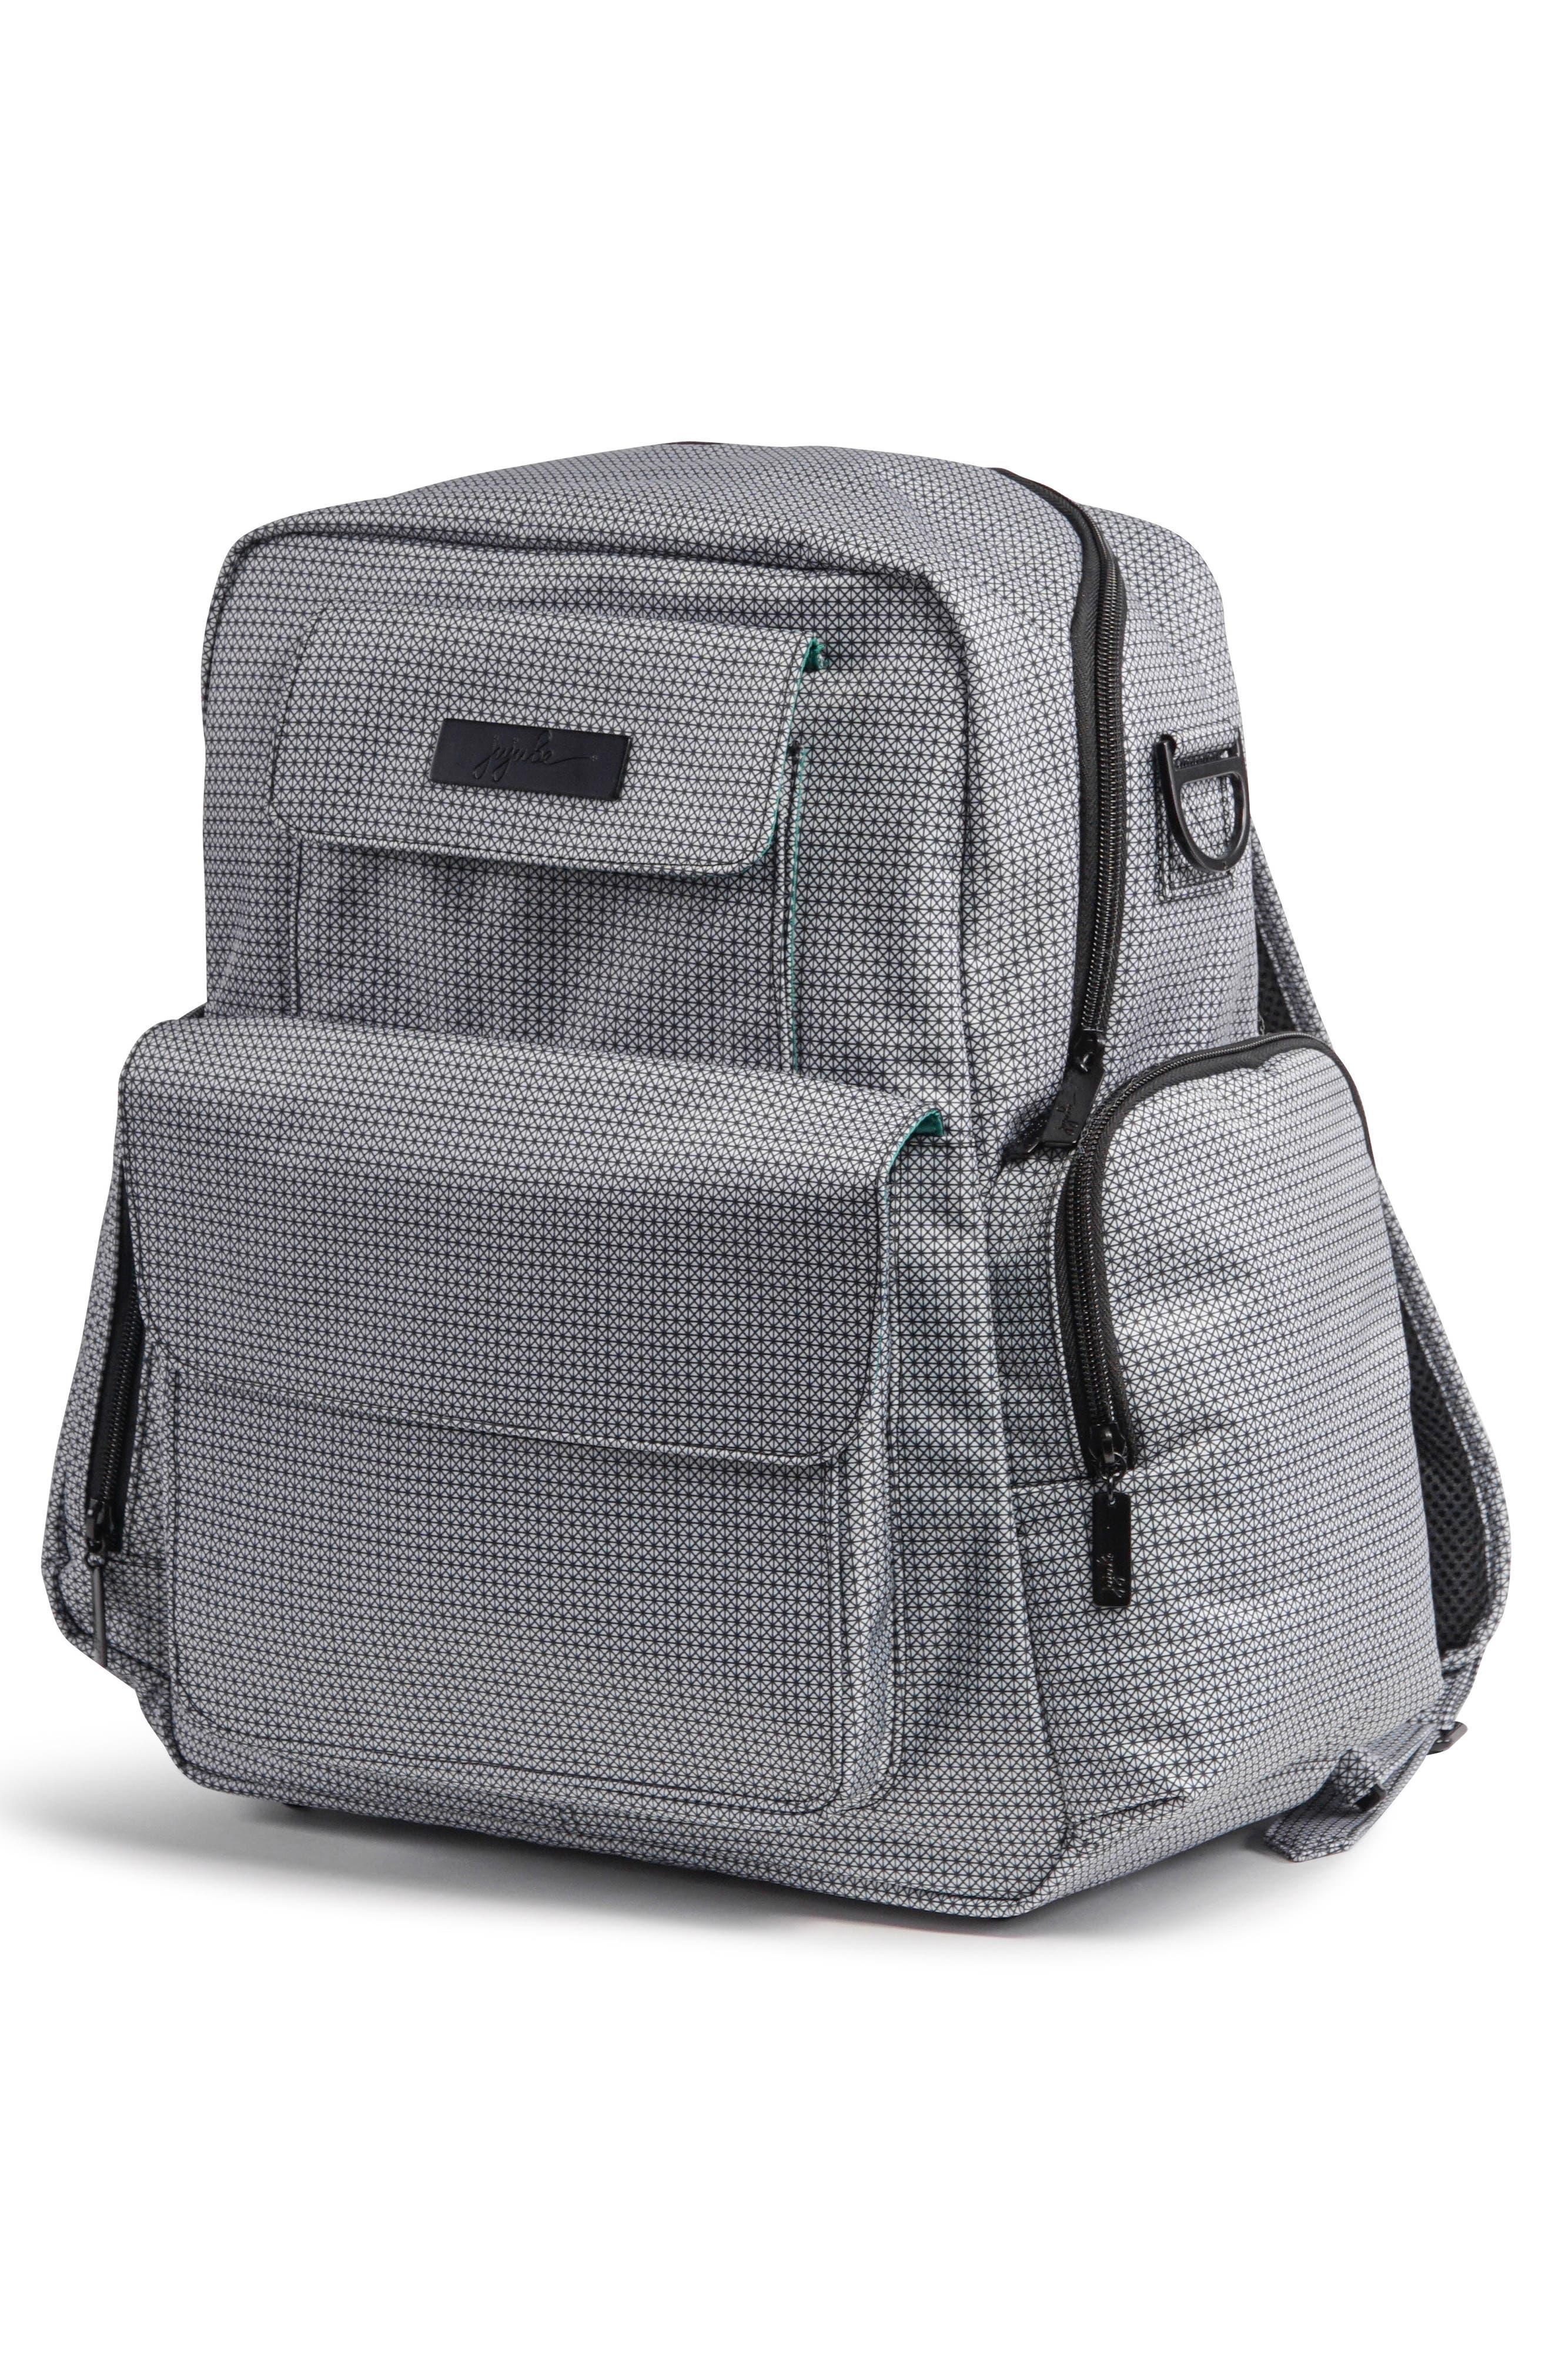 Be Nurtured Pumping Backpack,                             Alternate thumbnail 8, color,                             BLACK MATRIX